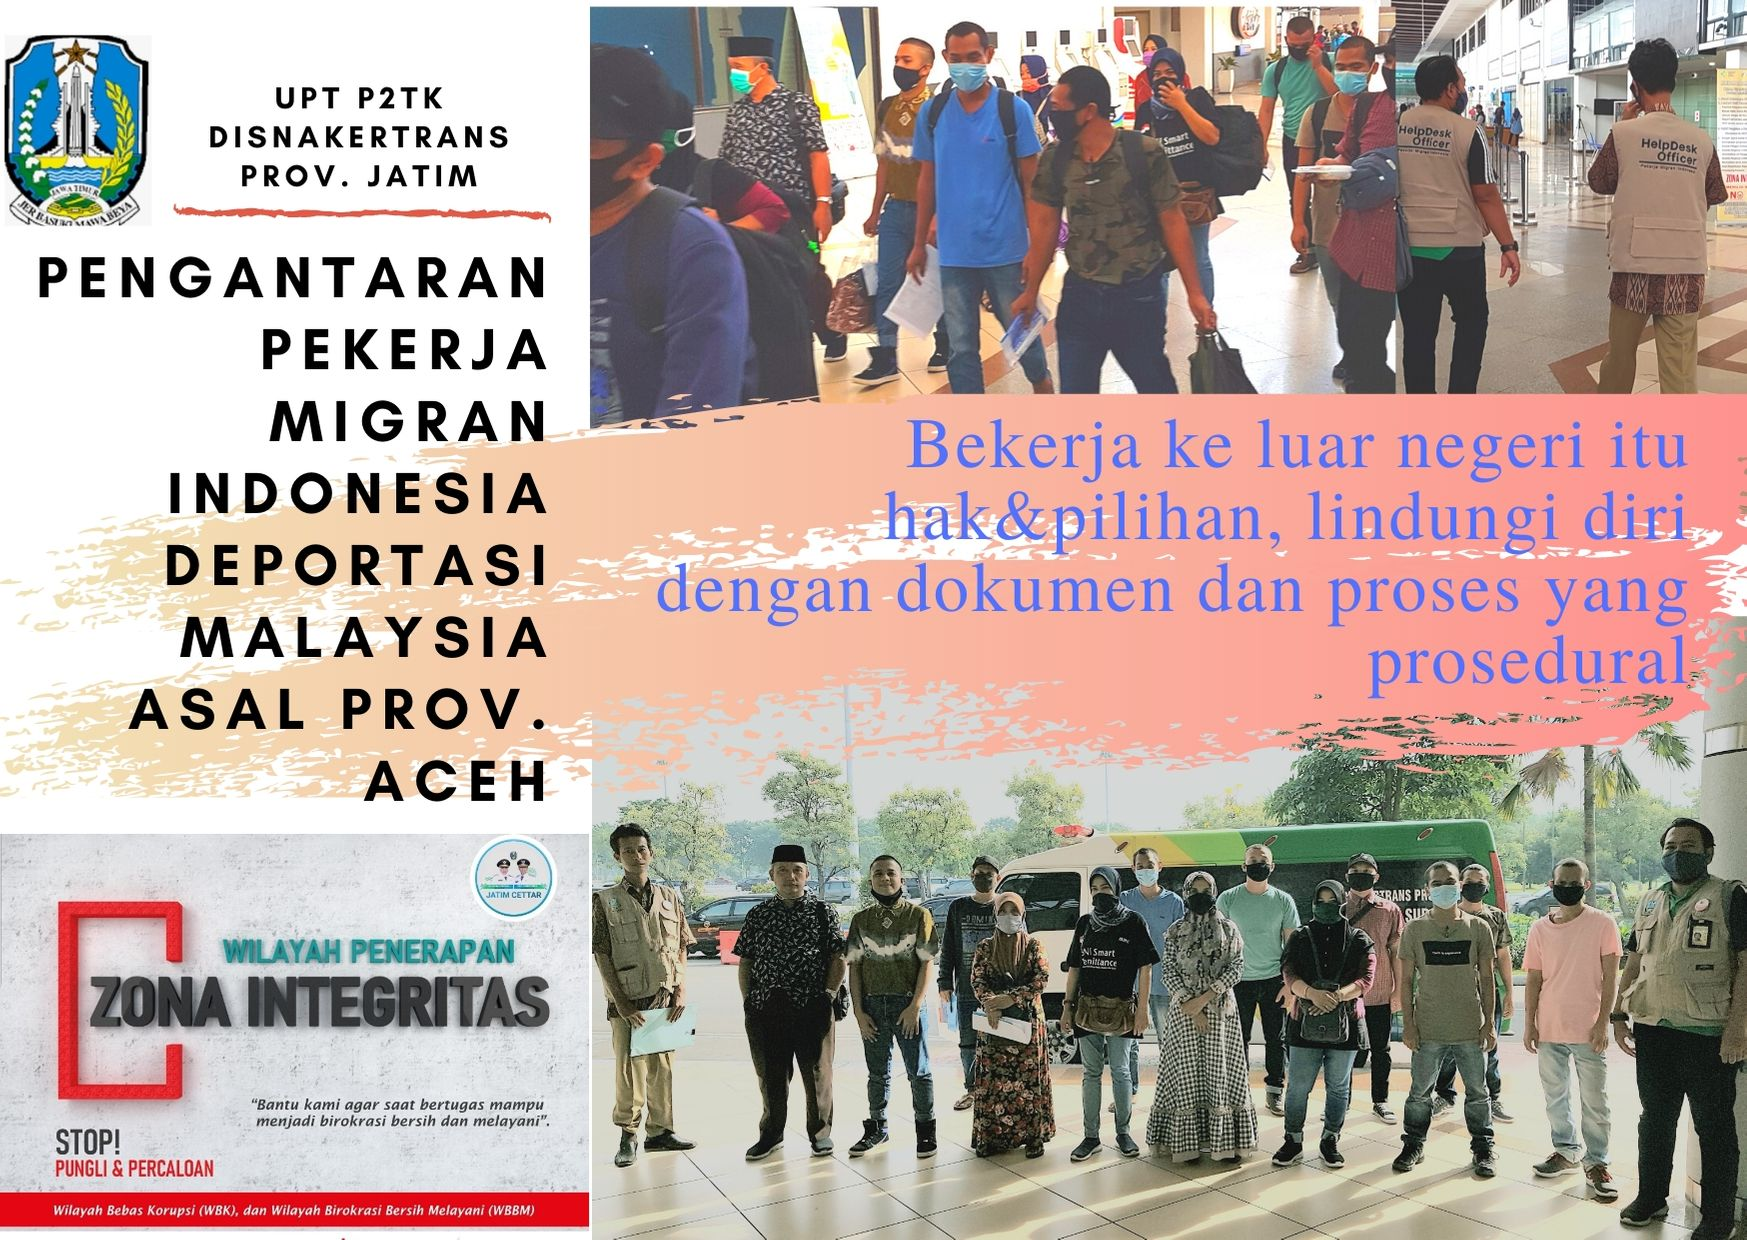 UPT P2TK Disnakertrans Jatim Fasilitasi Kepulangan PMI Deportasi asal Malaysia